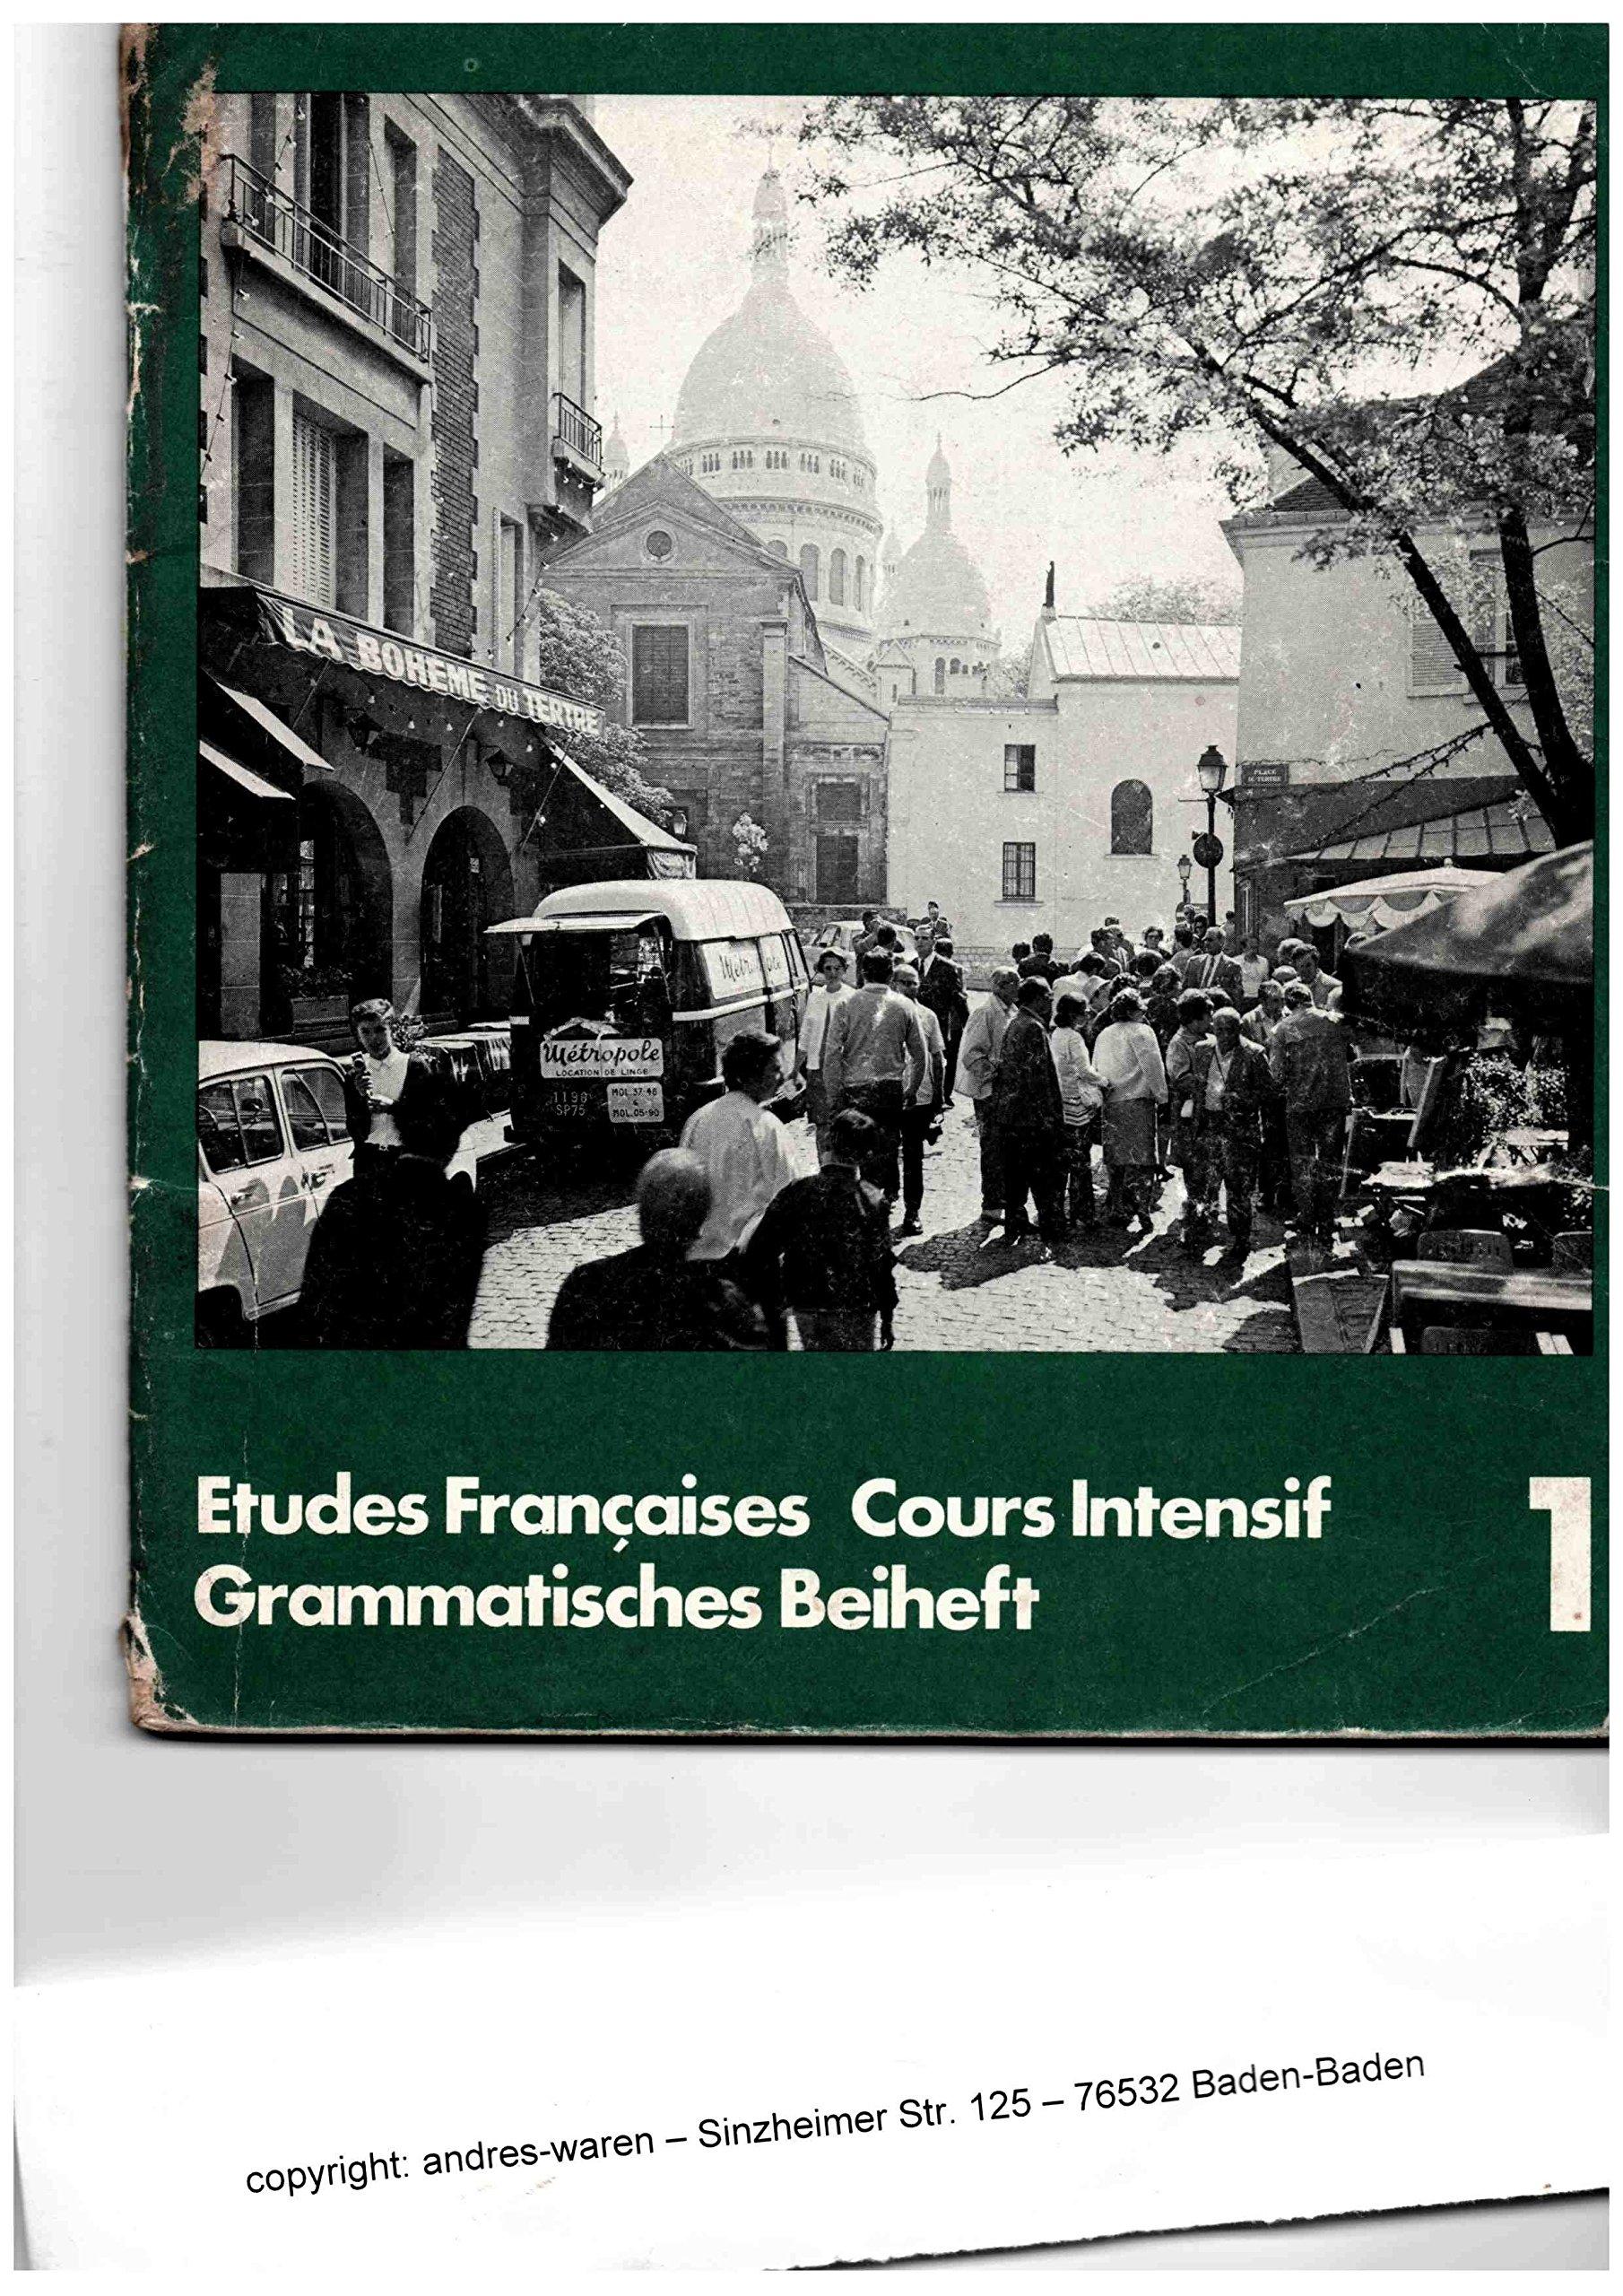 Etudes Francaises, Cours Intensif 1, Grammatisches Beiheft